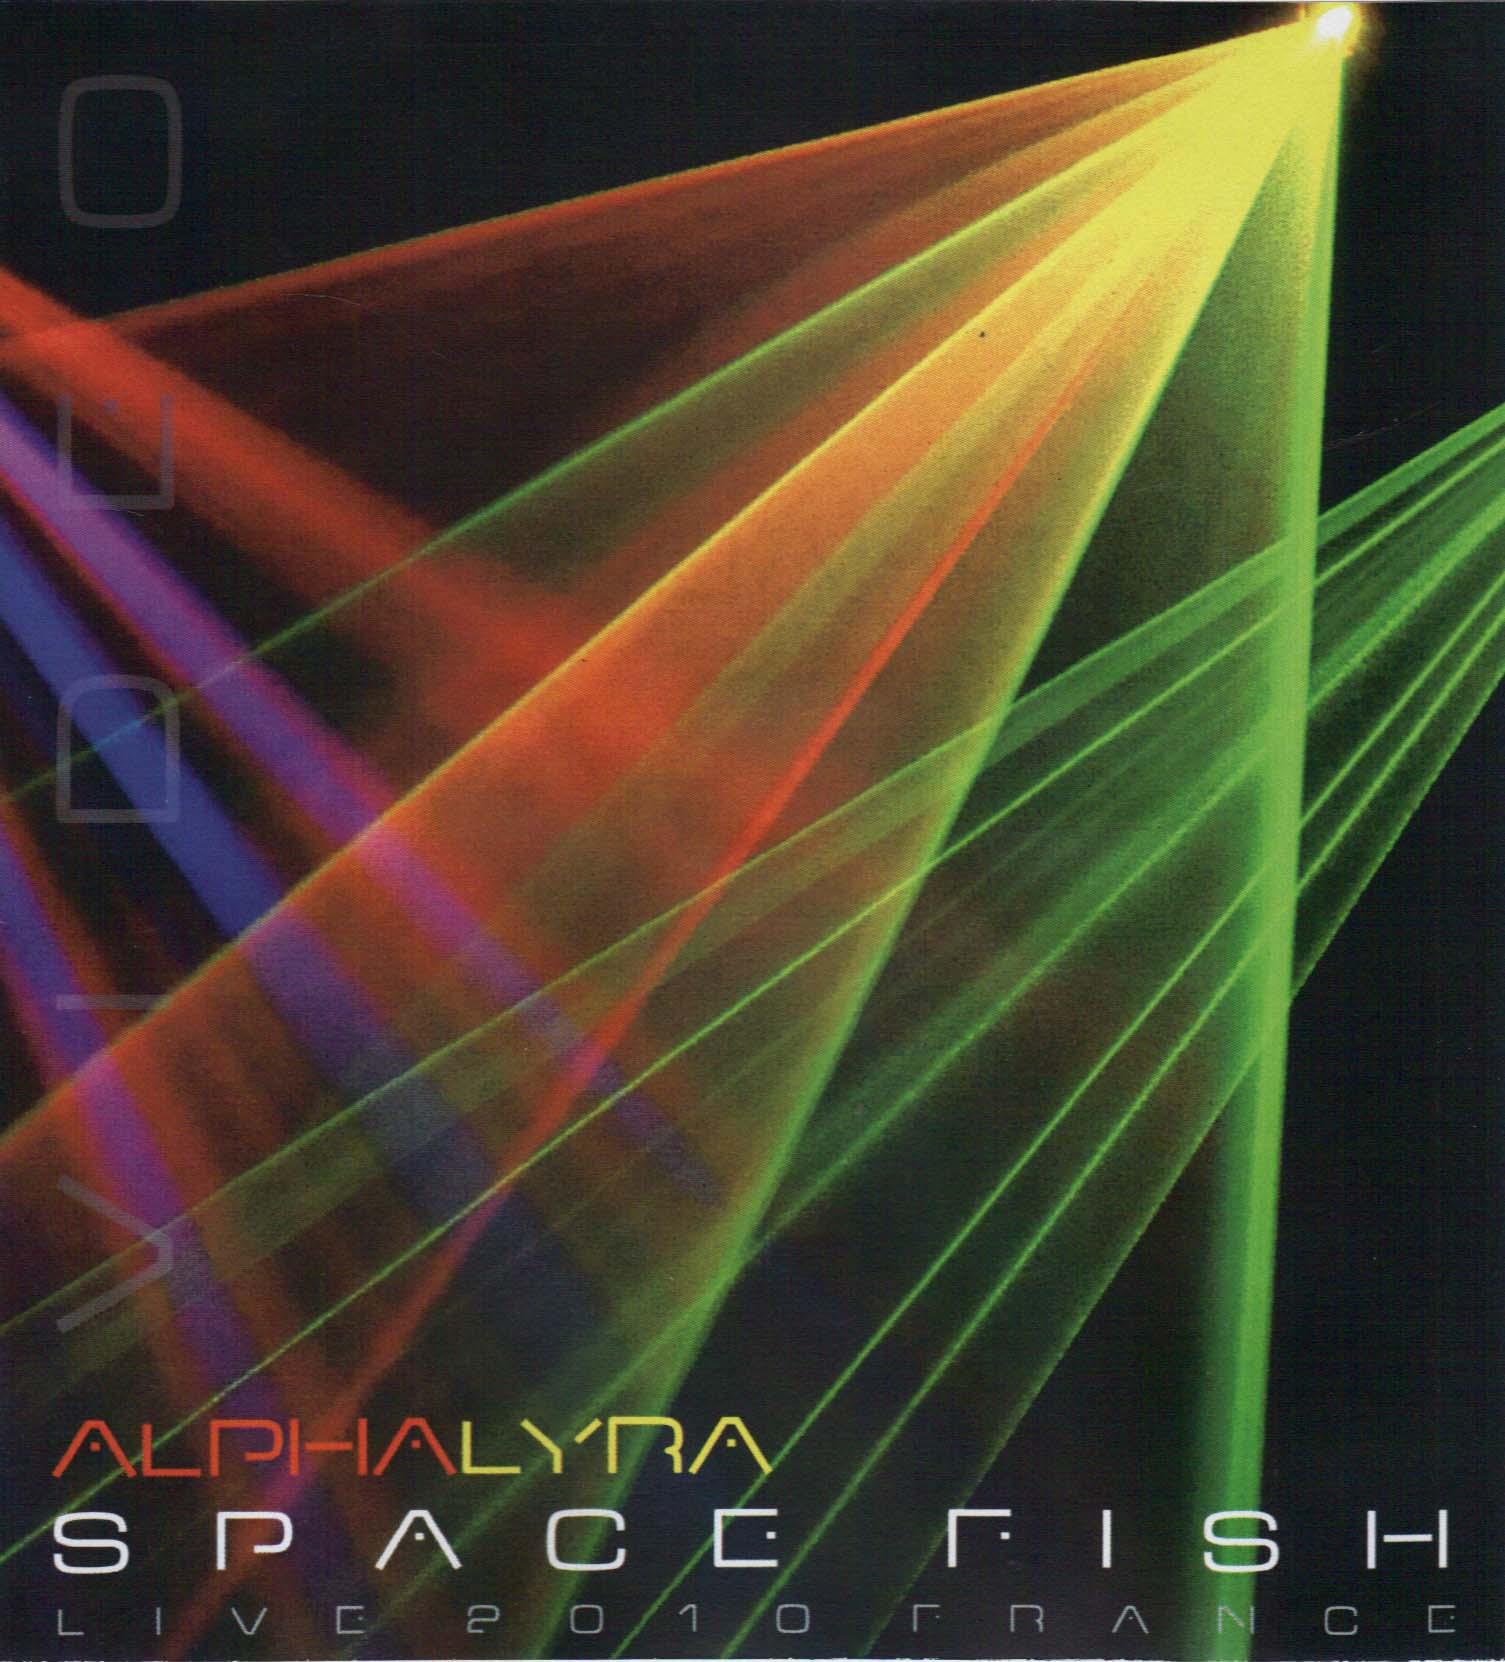 ALPHALYRA - Space Fish - DVD